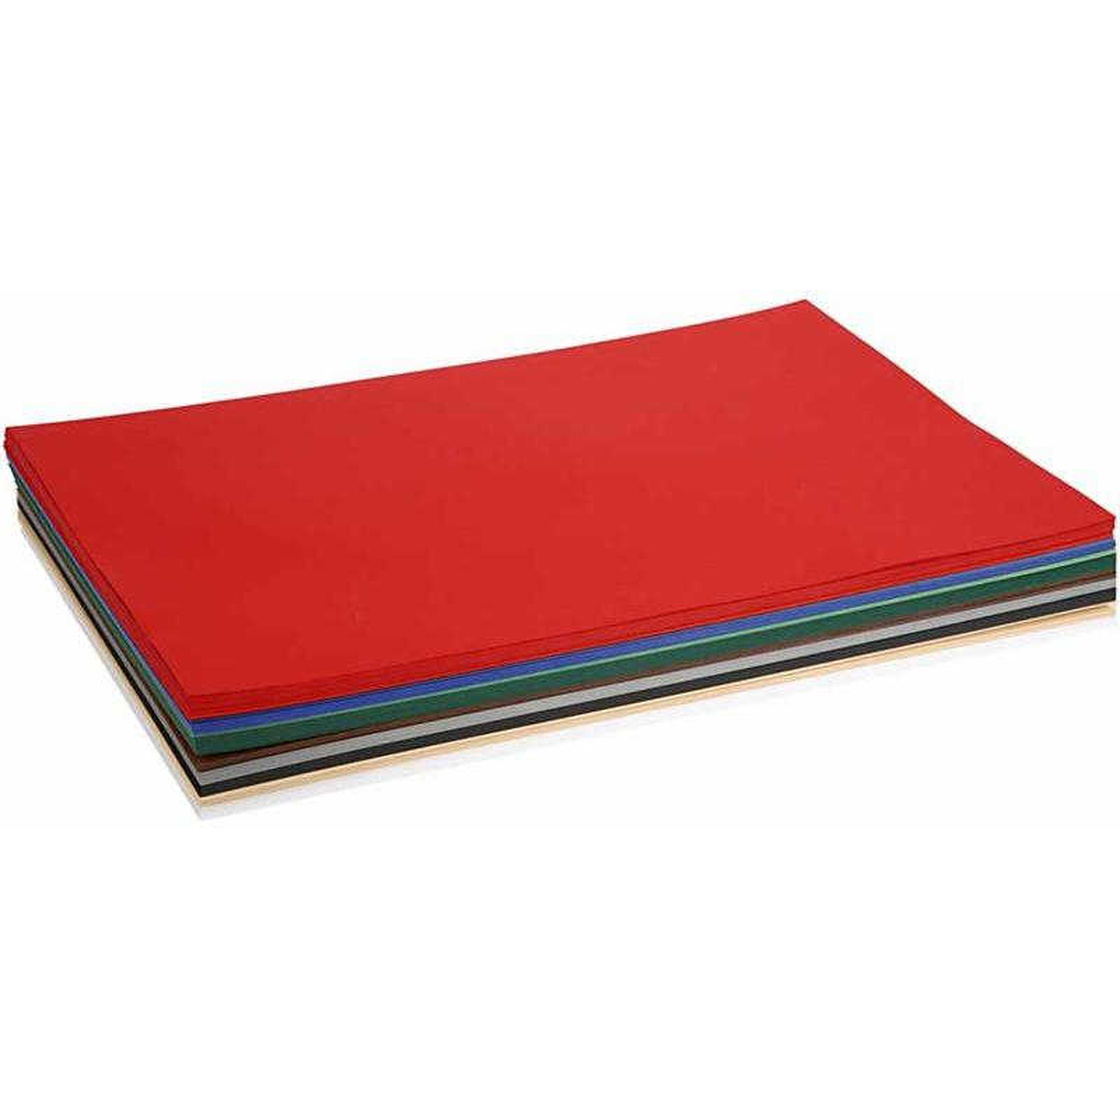 180 g Farbkarton zum Basteln 20Bl A2 420x600 mm Sortierte Farben sort.